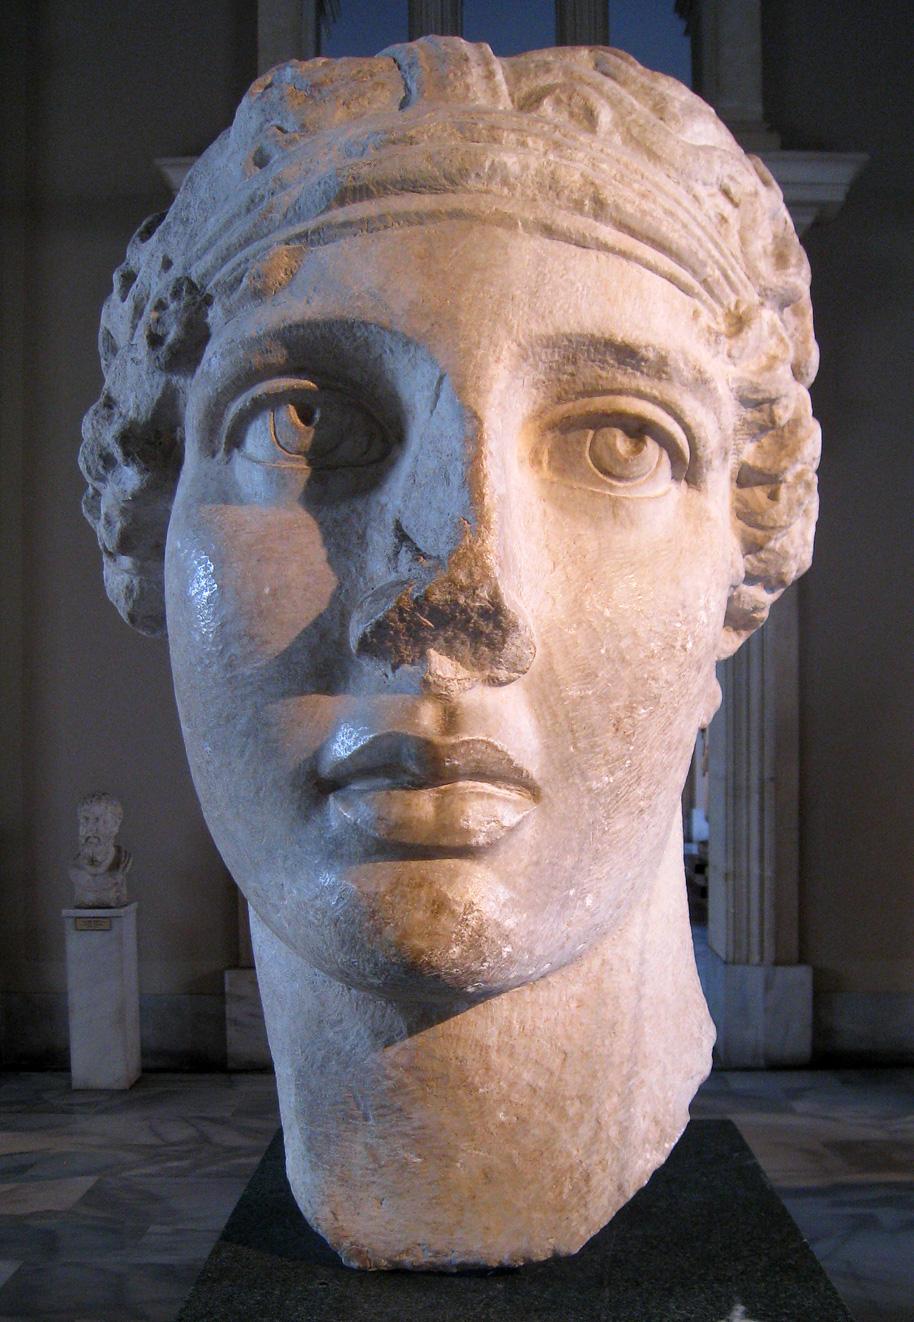 Greek poet sappho